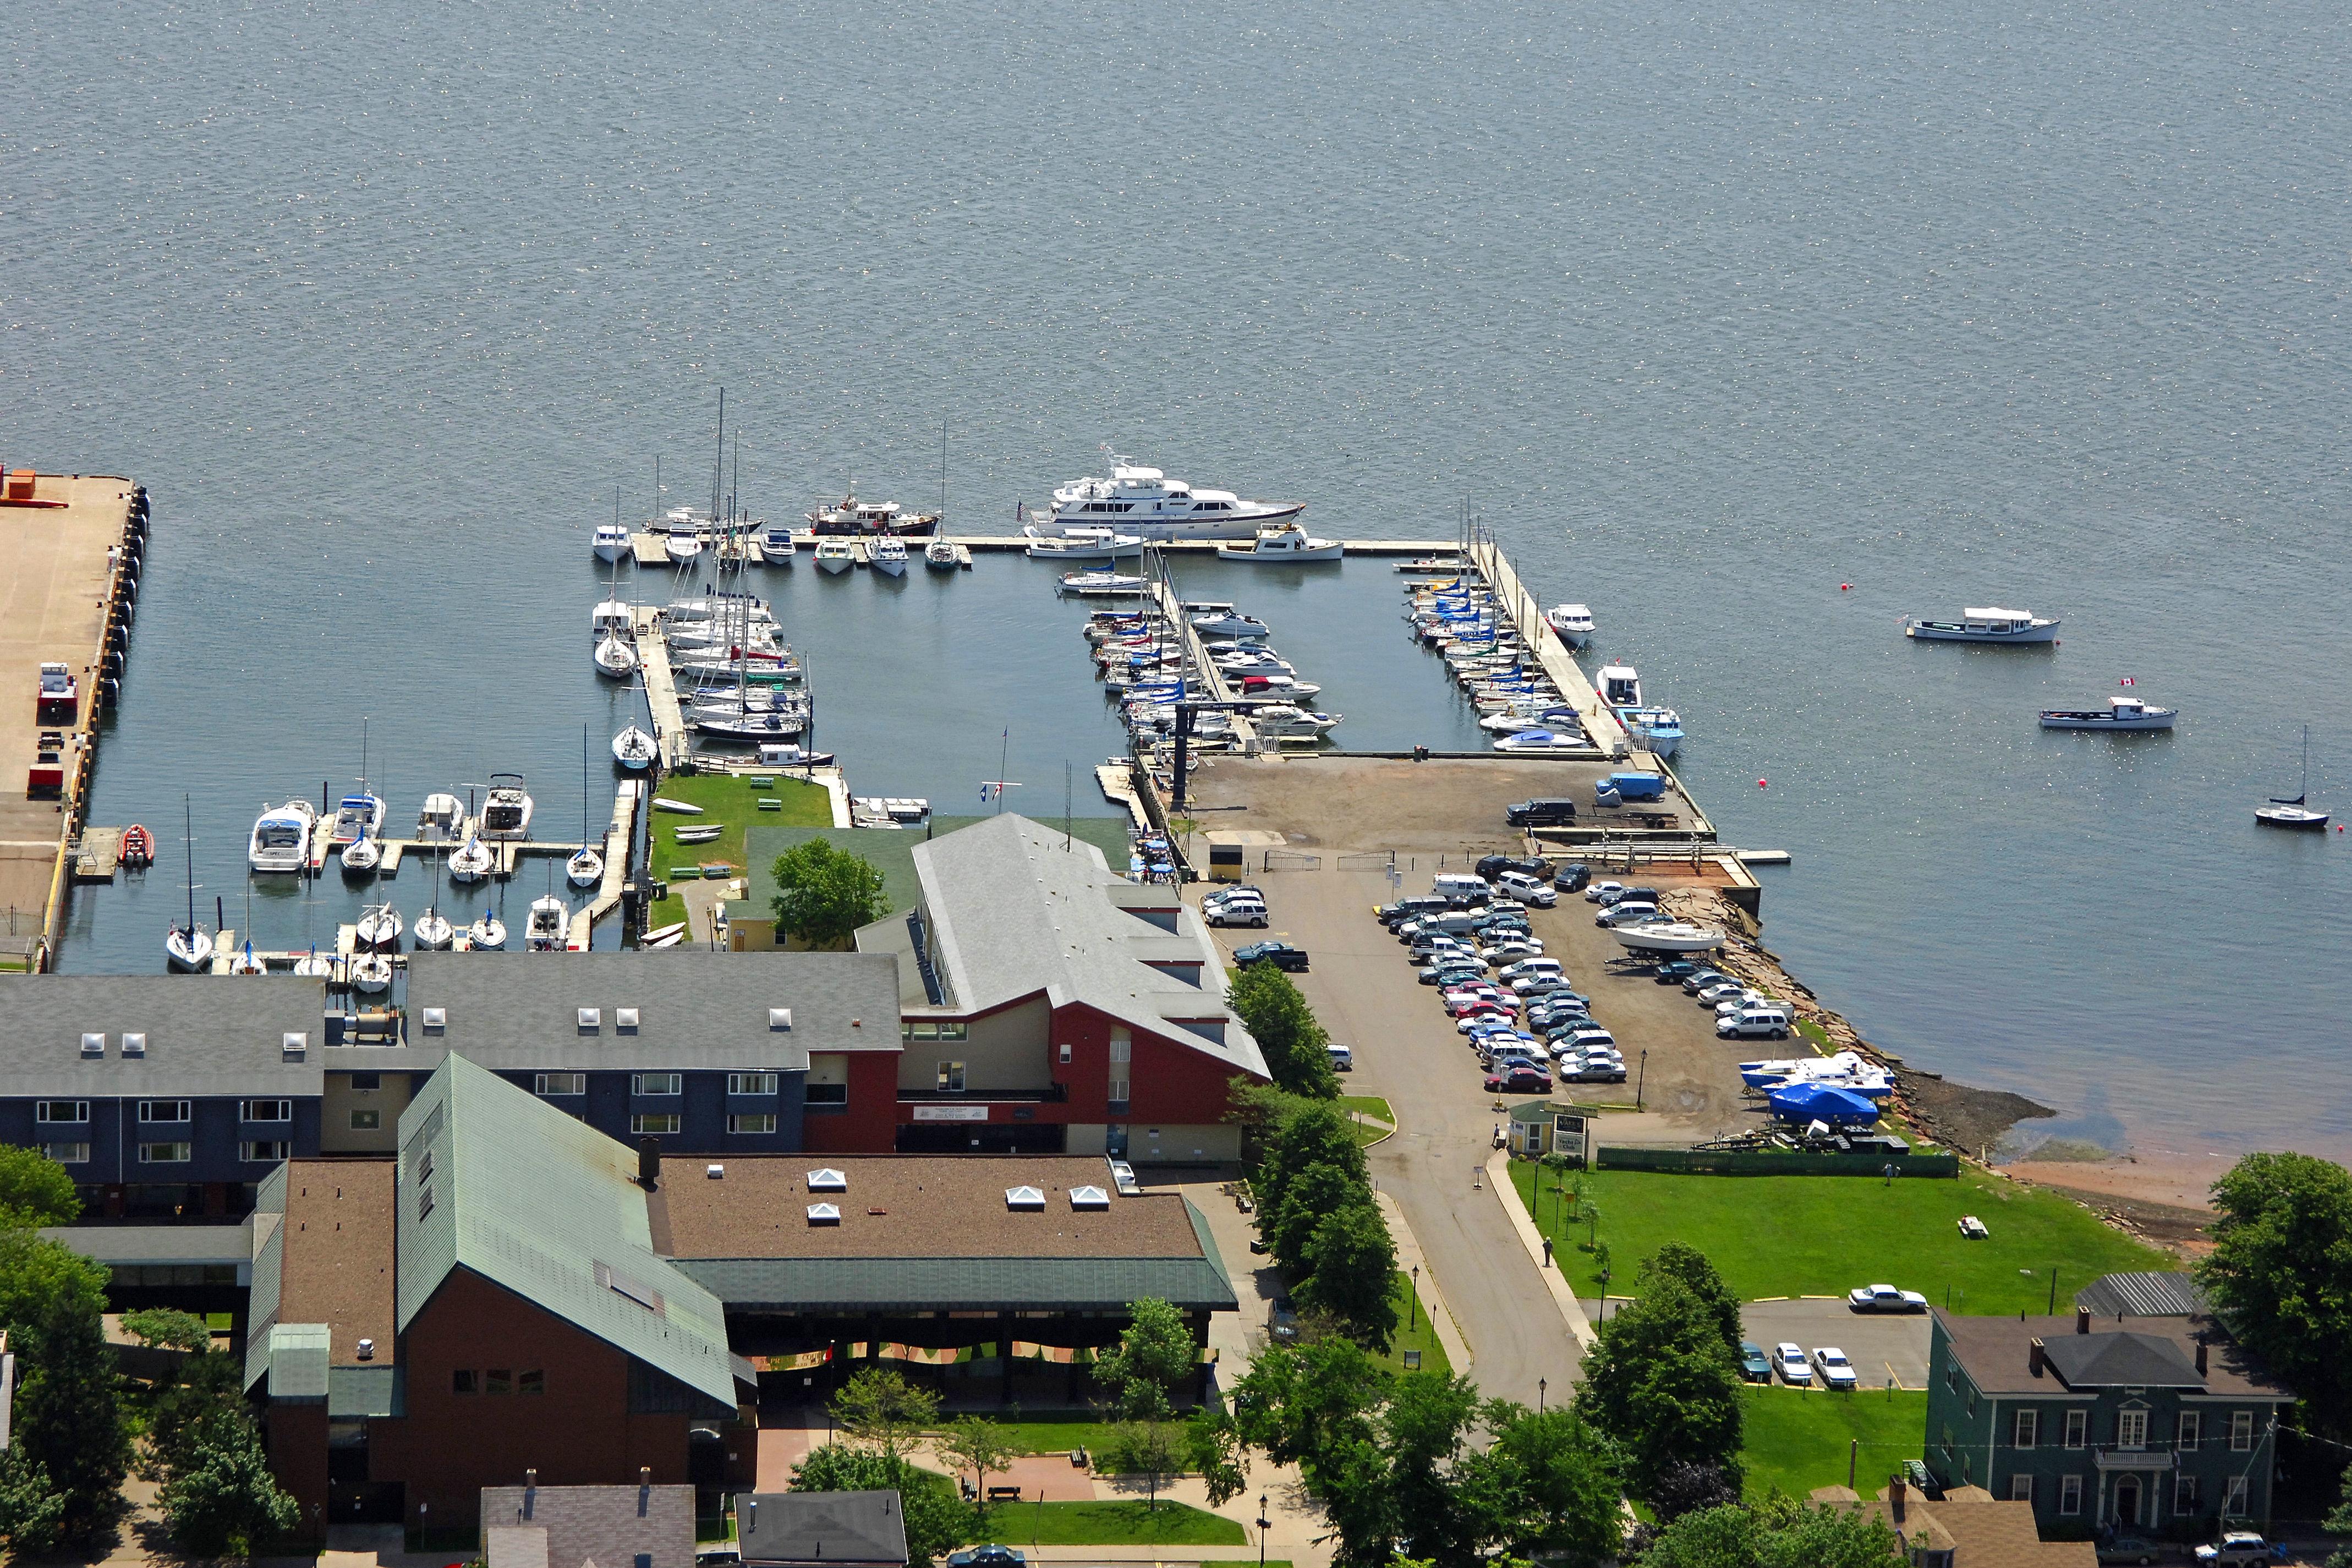 Charlottetown Yacht Club In Charlottetown PE Canada